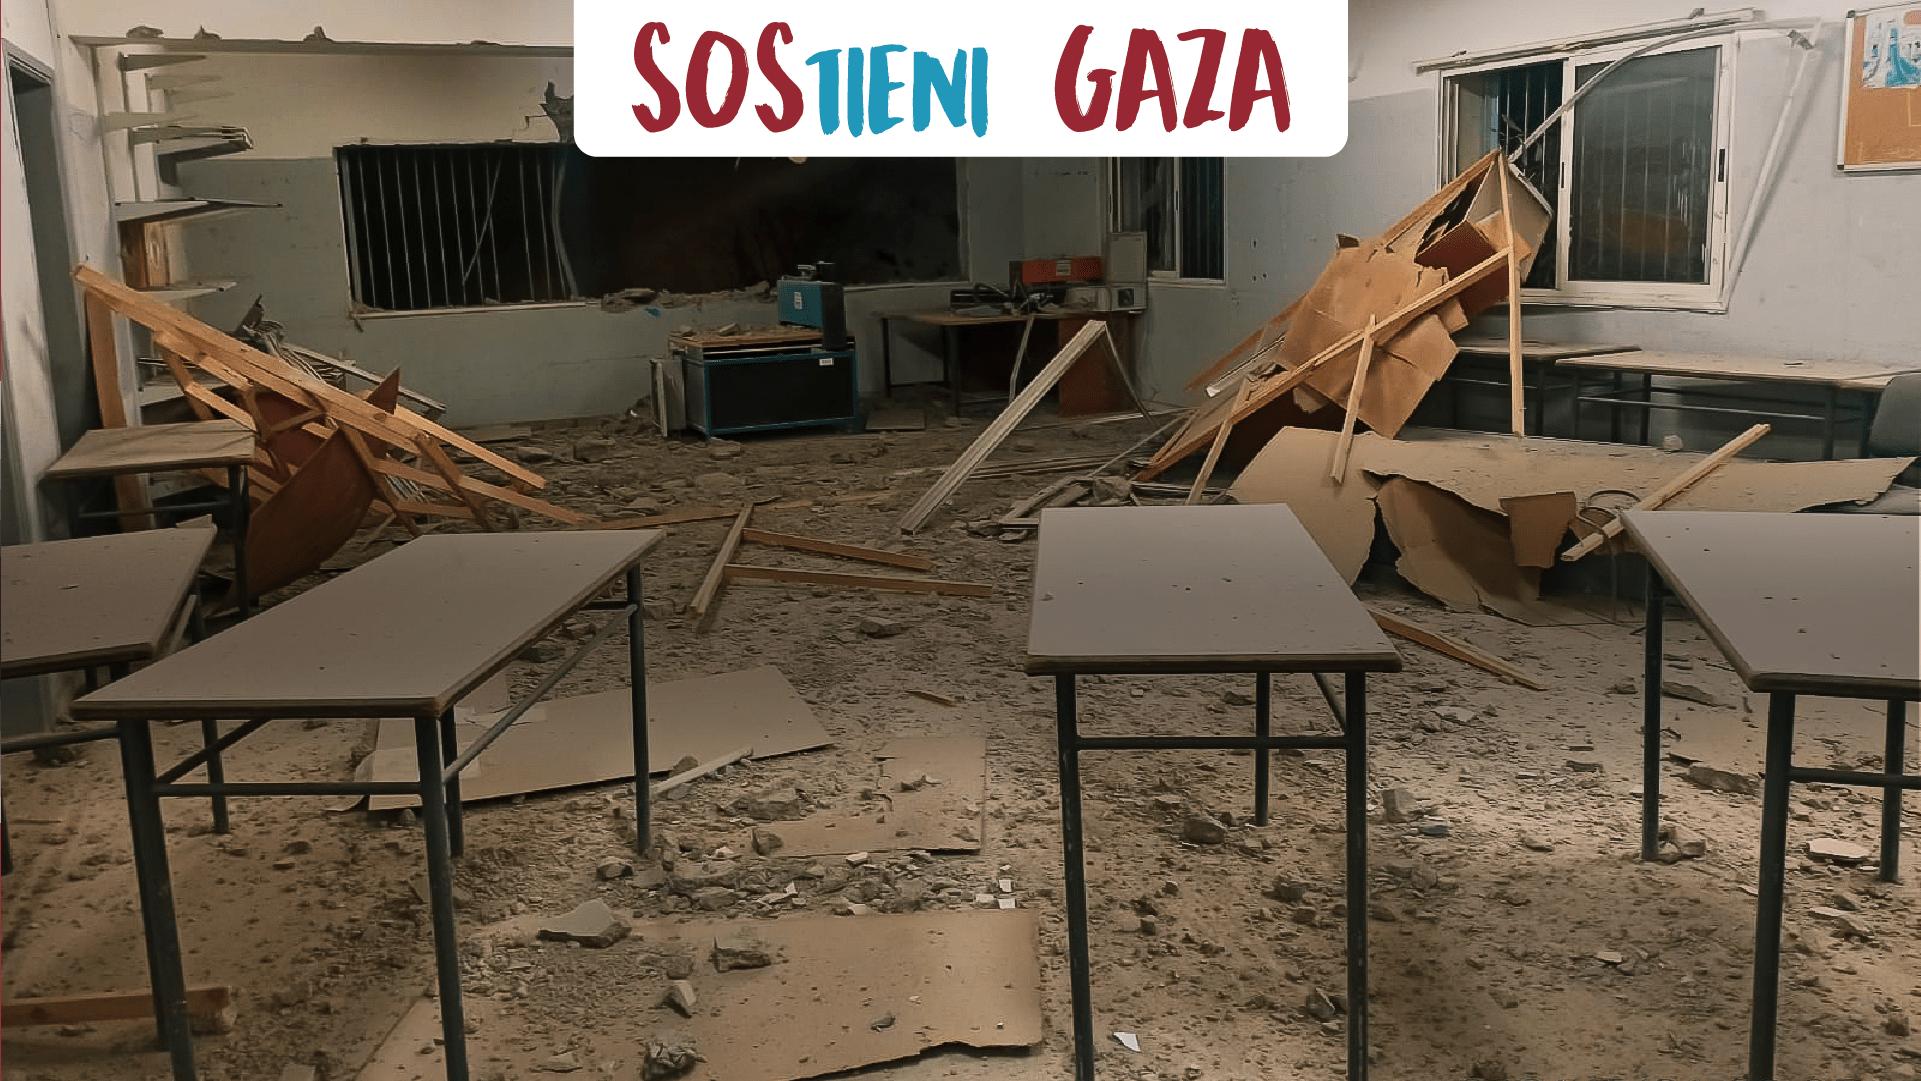 SOSTIENI GAZA